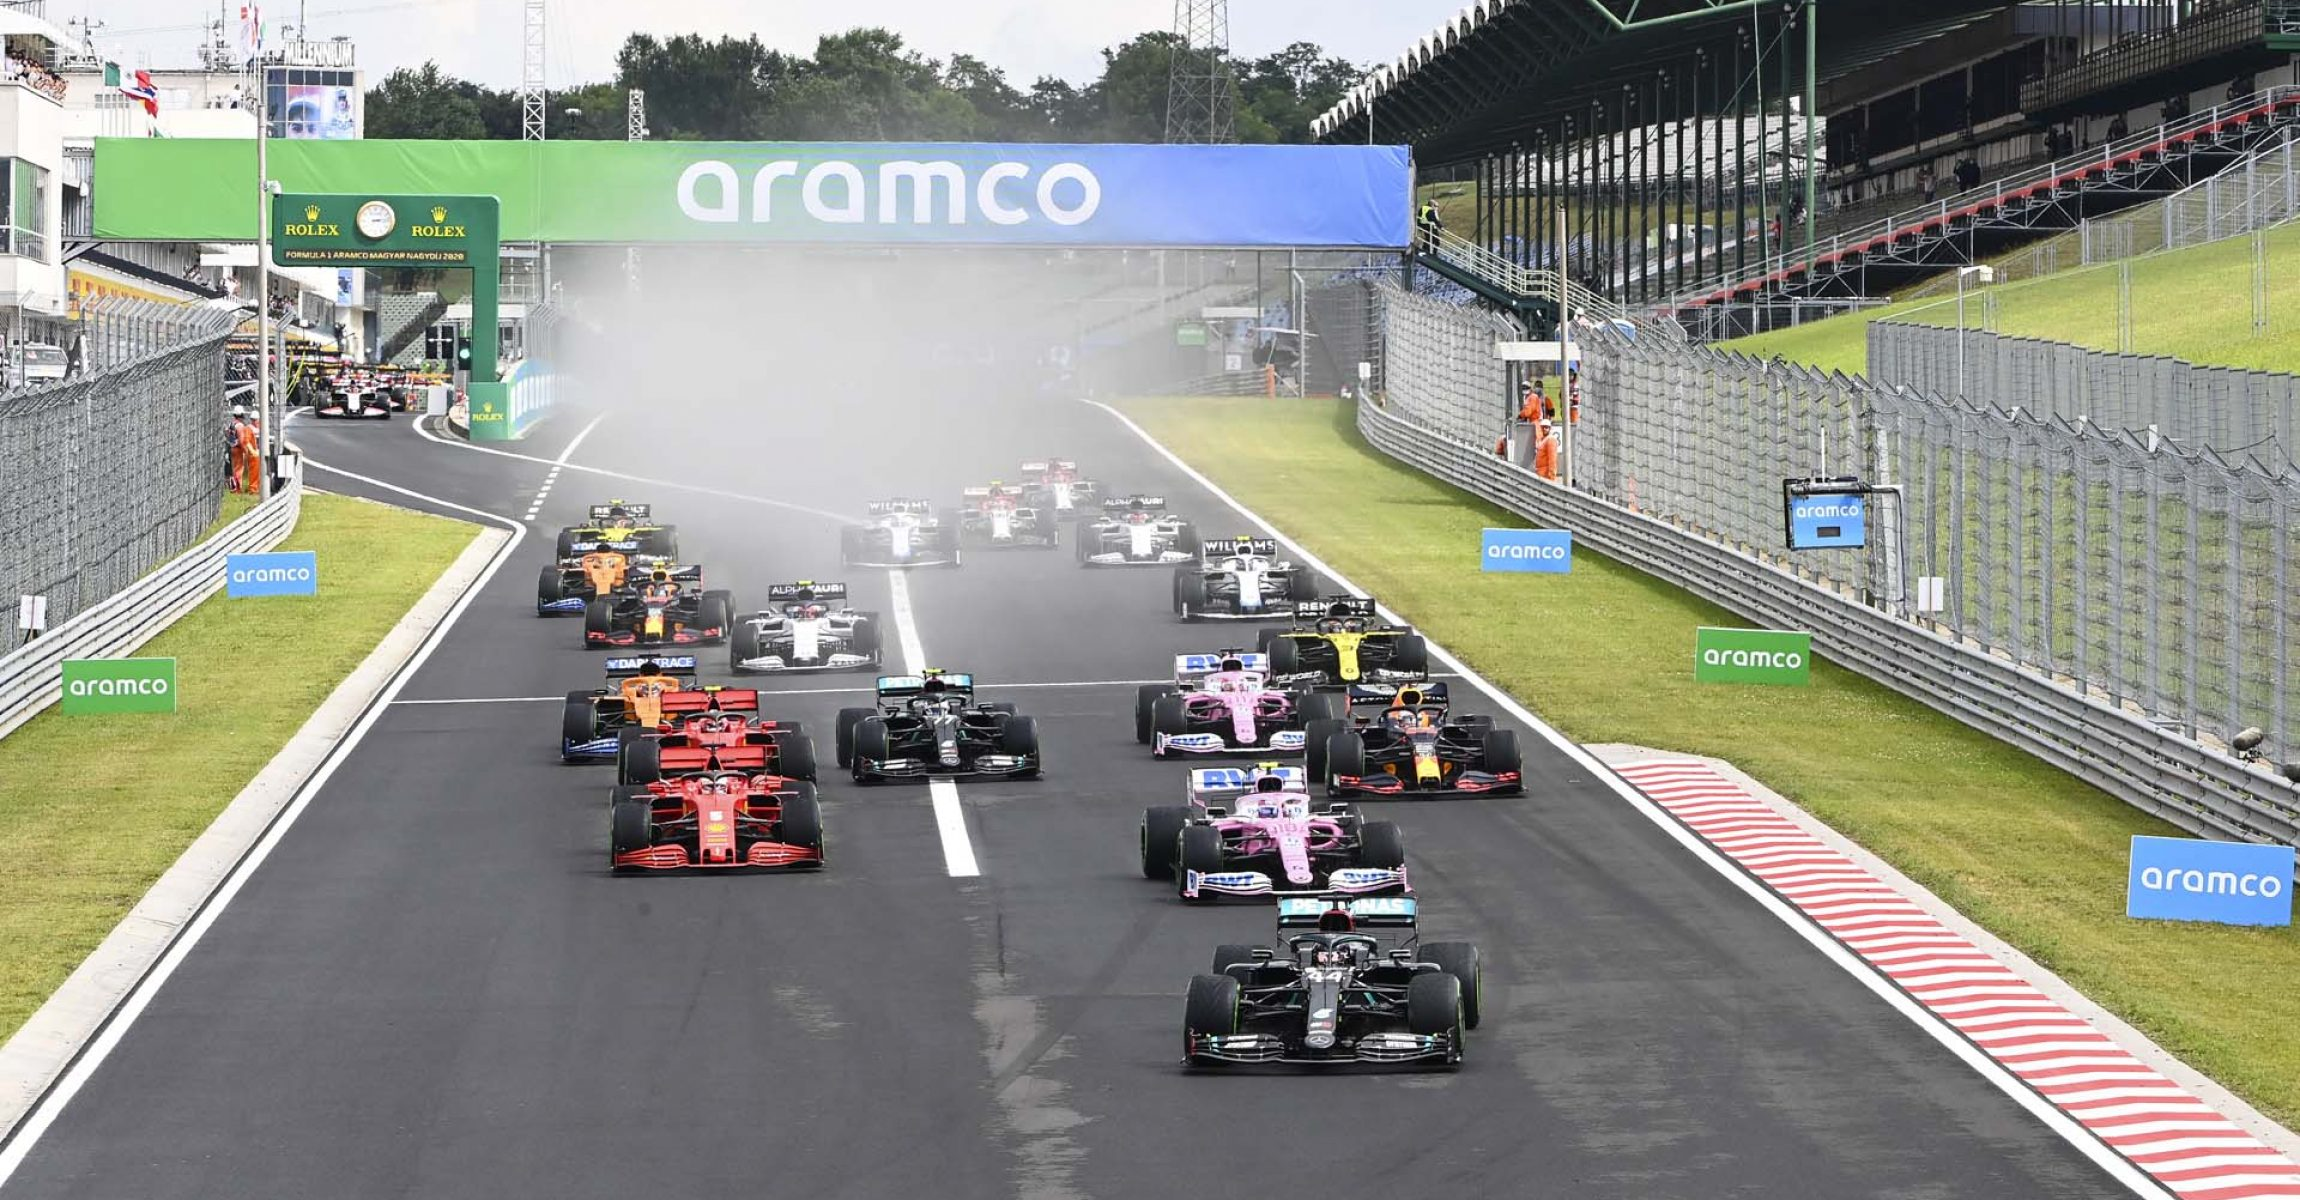 Lewis Hamilton, Mercedes F1 W11 EQ Performance leads Lance Stroll, Racing Point RP20 and Sebastian Vettel, Ferrari SF1000 at the start of the race